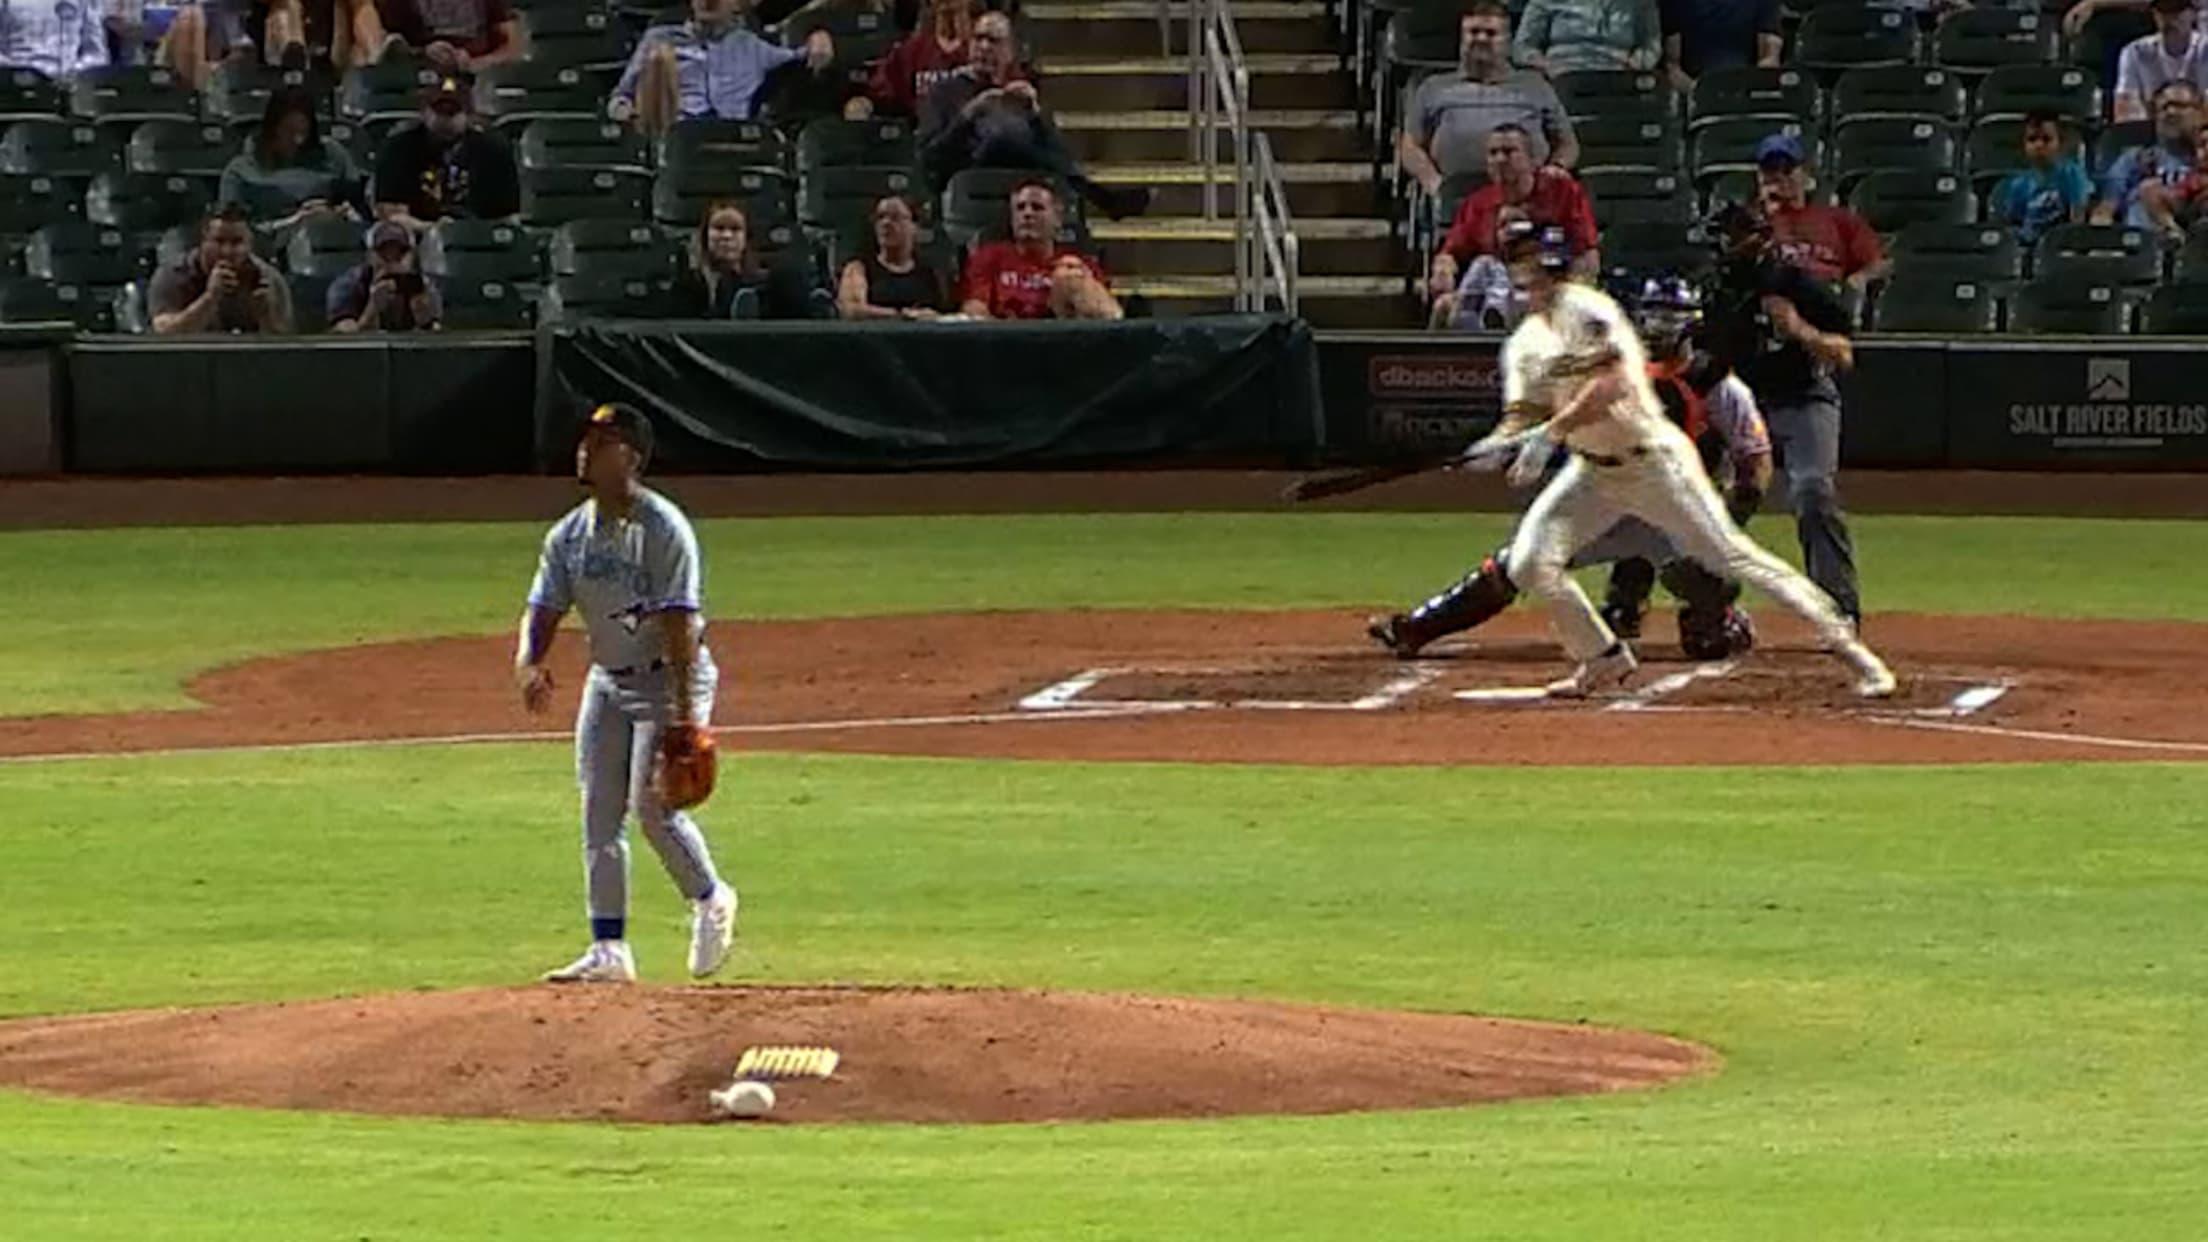 Joey Wiemer's two-run home run